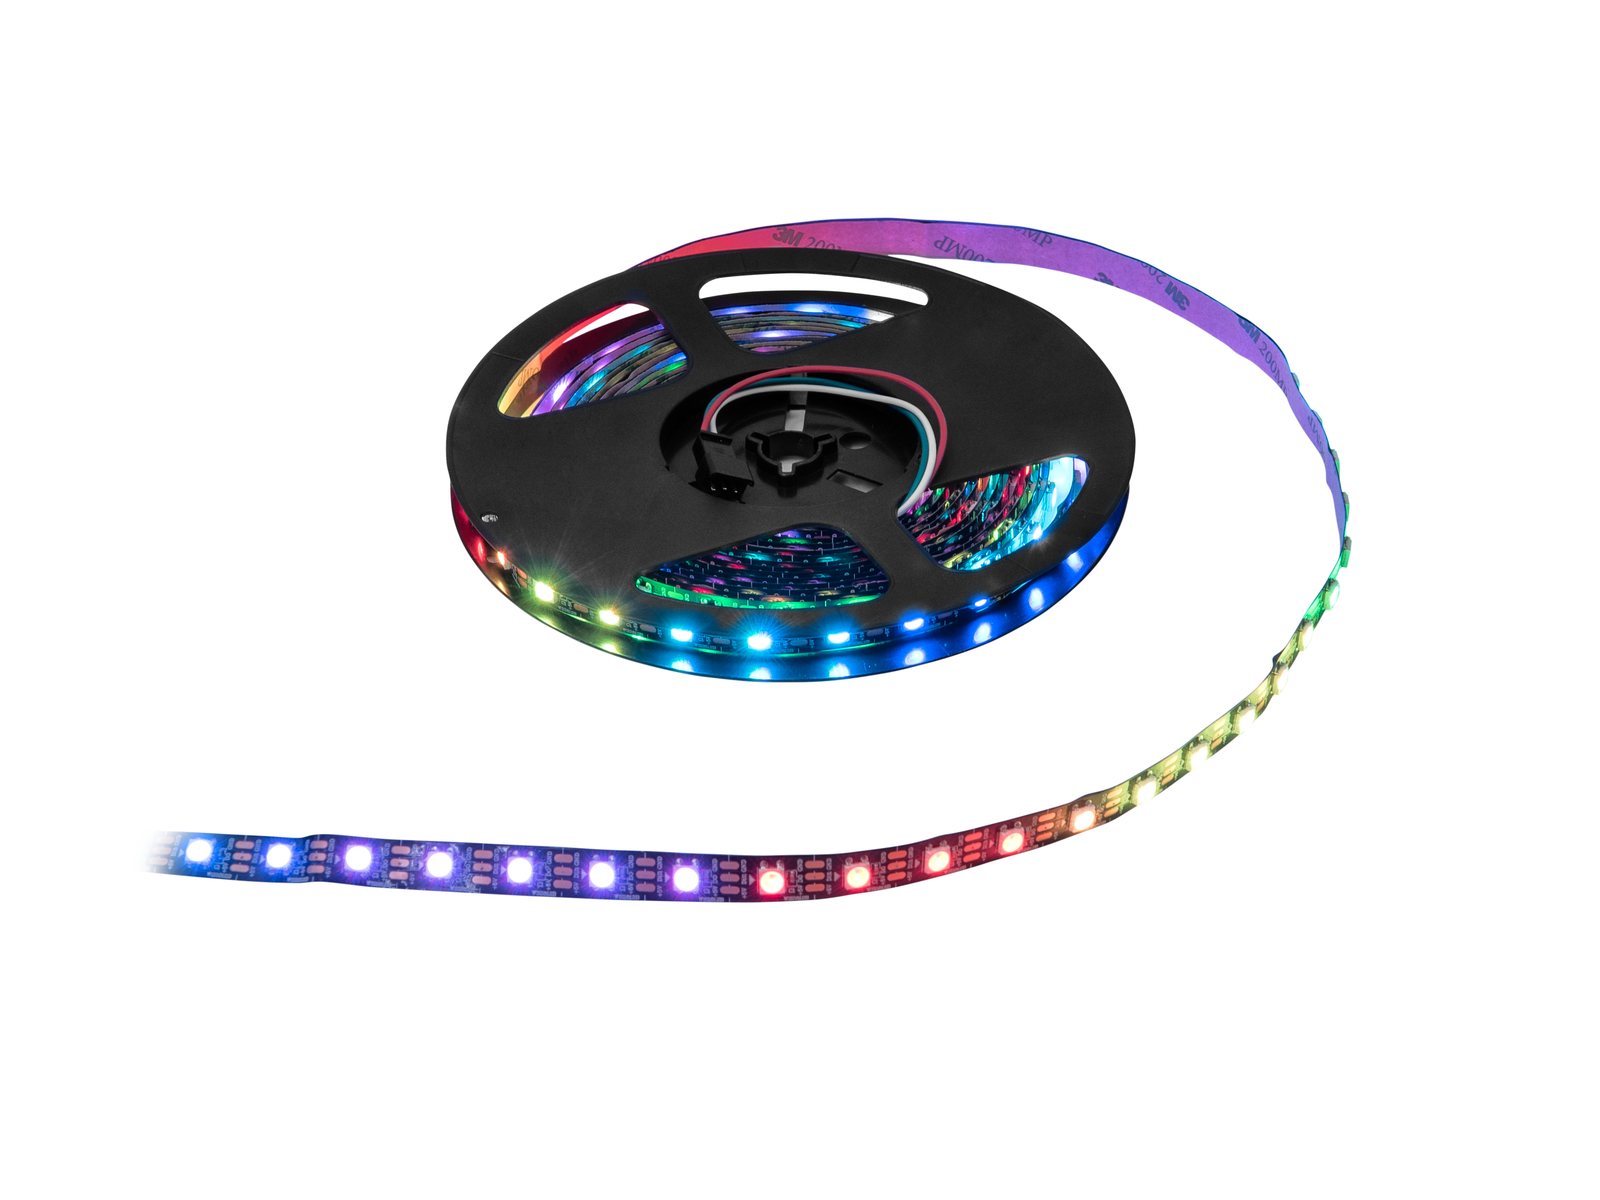 EUROLITE LED Pixel Strip 150 2,5m RGB 5V